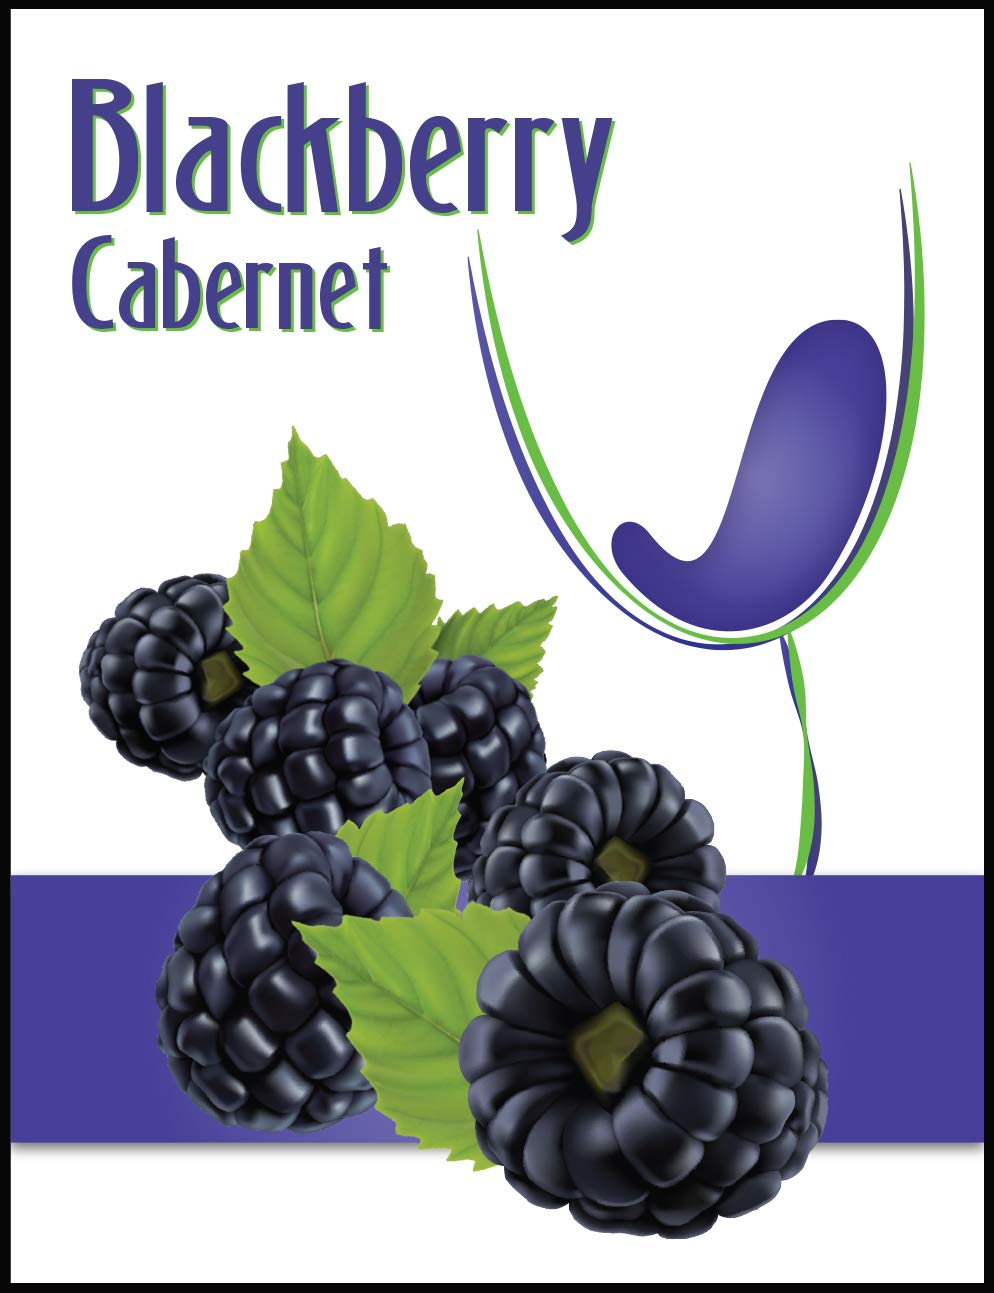 Island Mist Blackberry Cabernet Labels